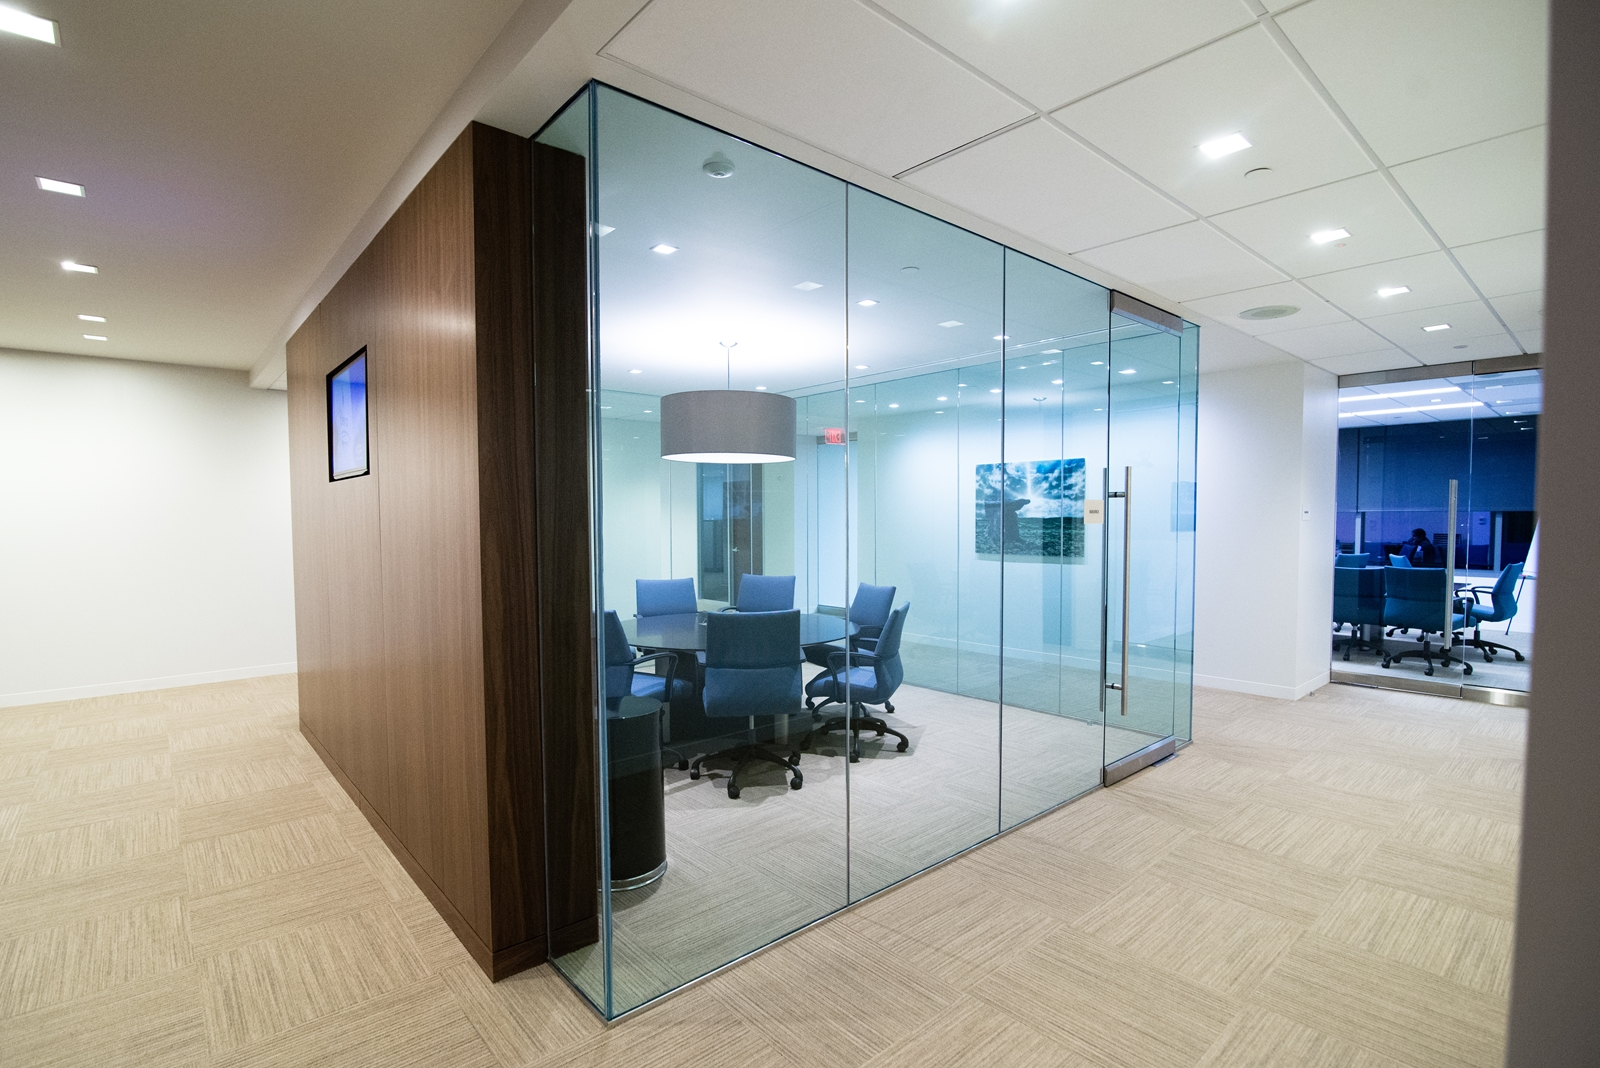 Interiors-061.jpg